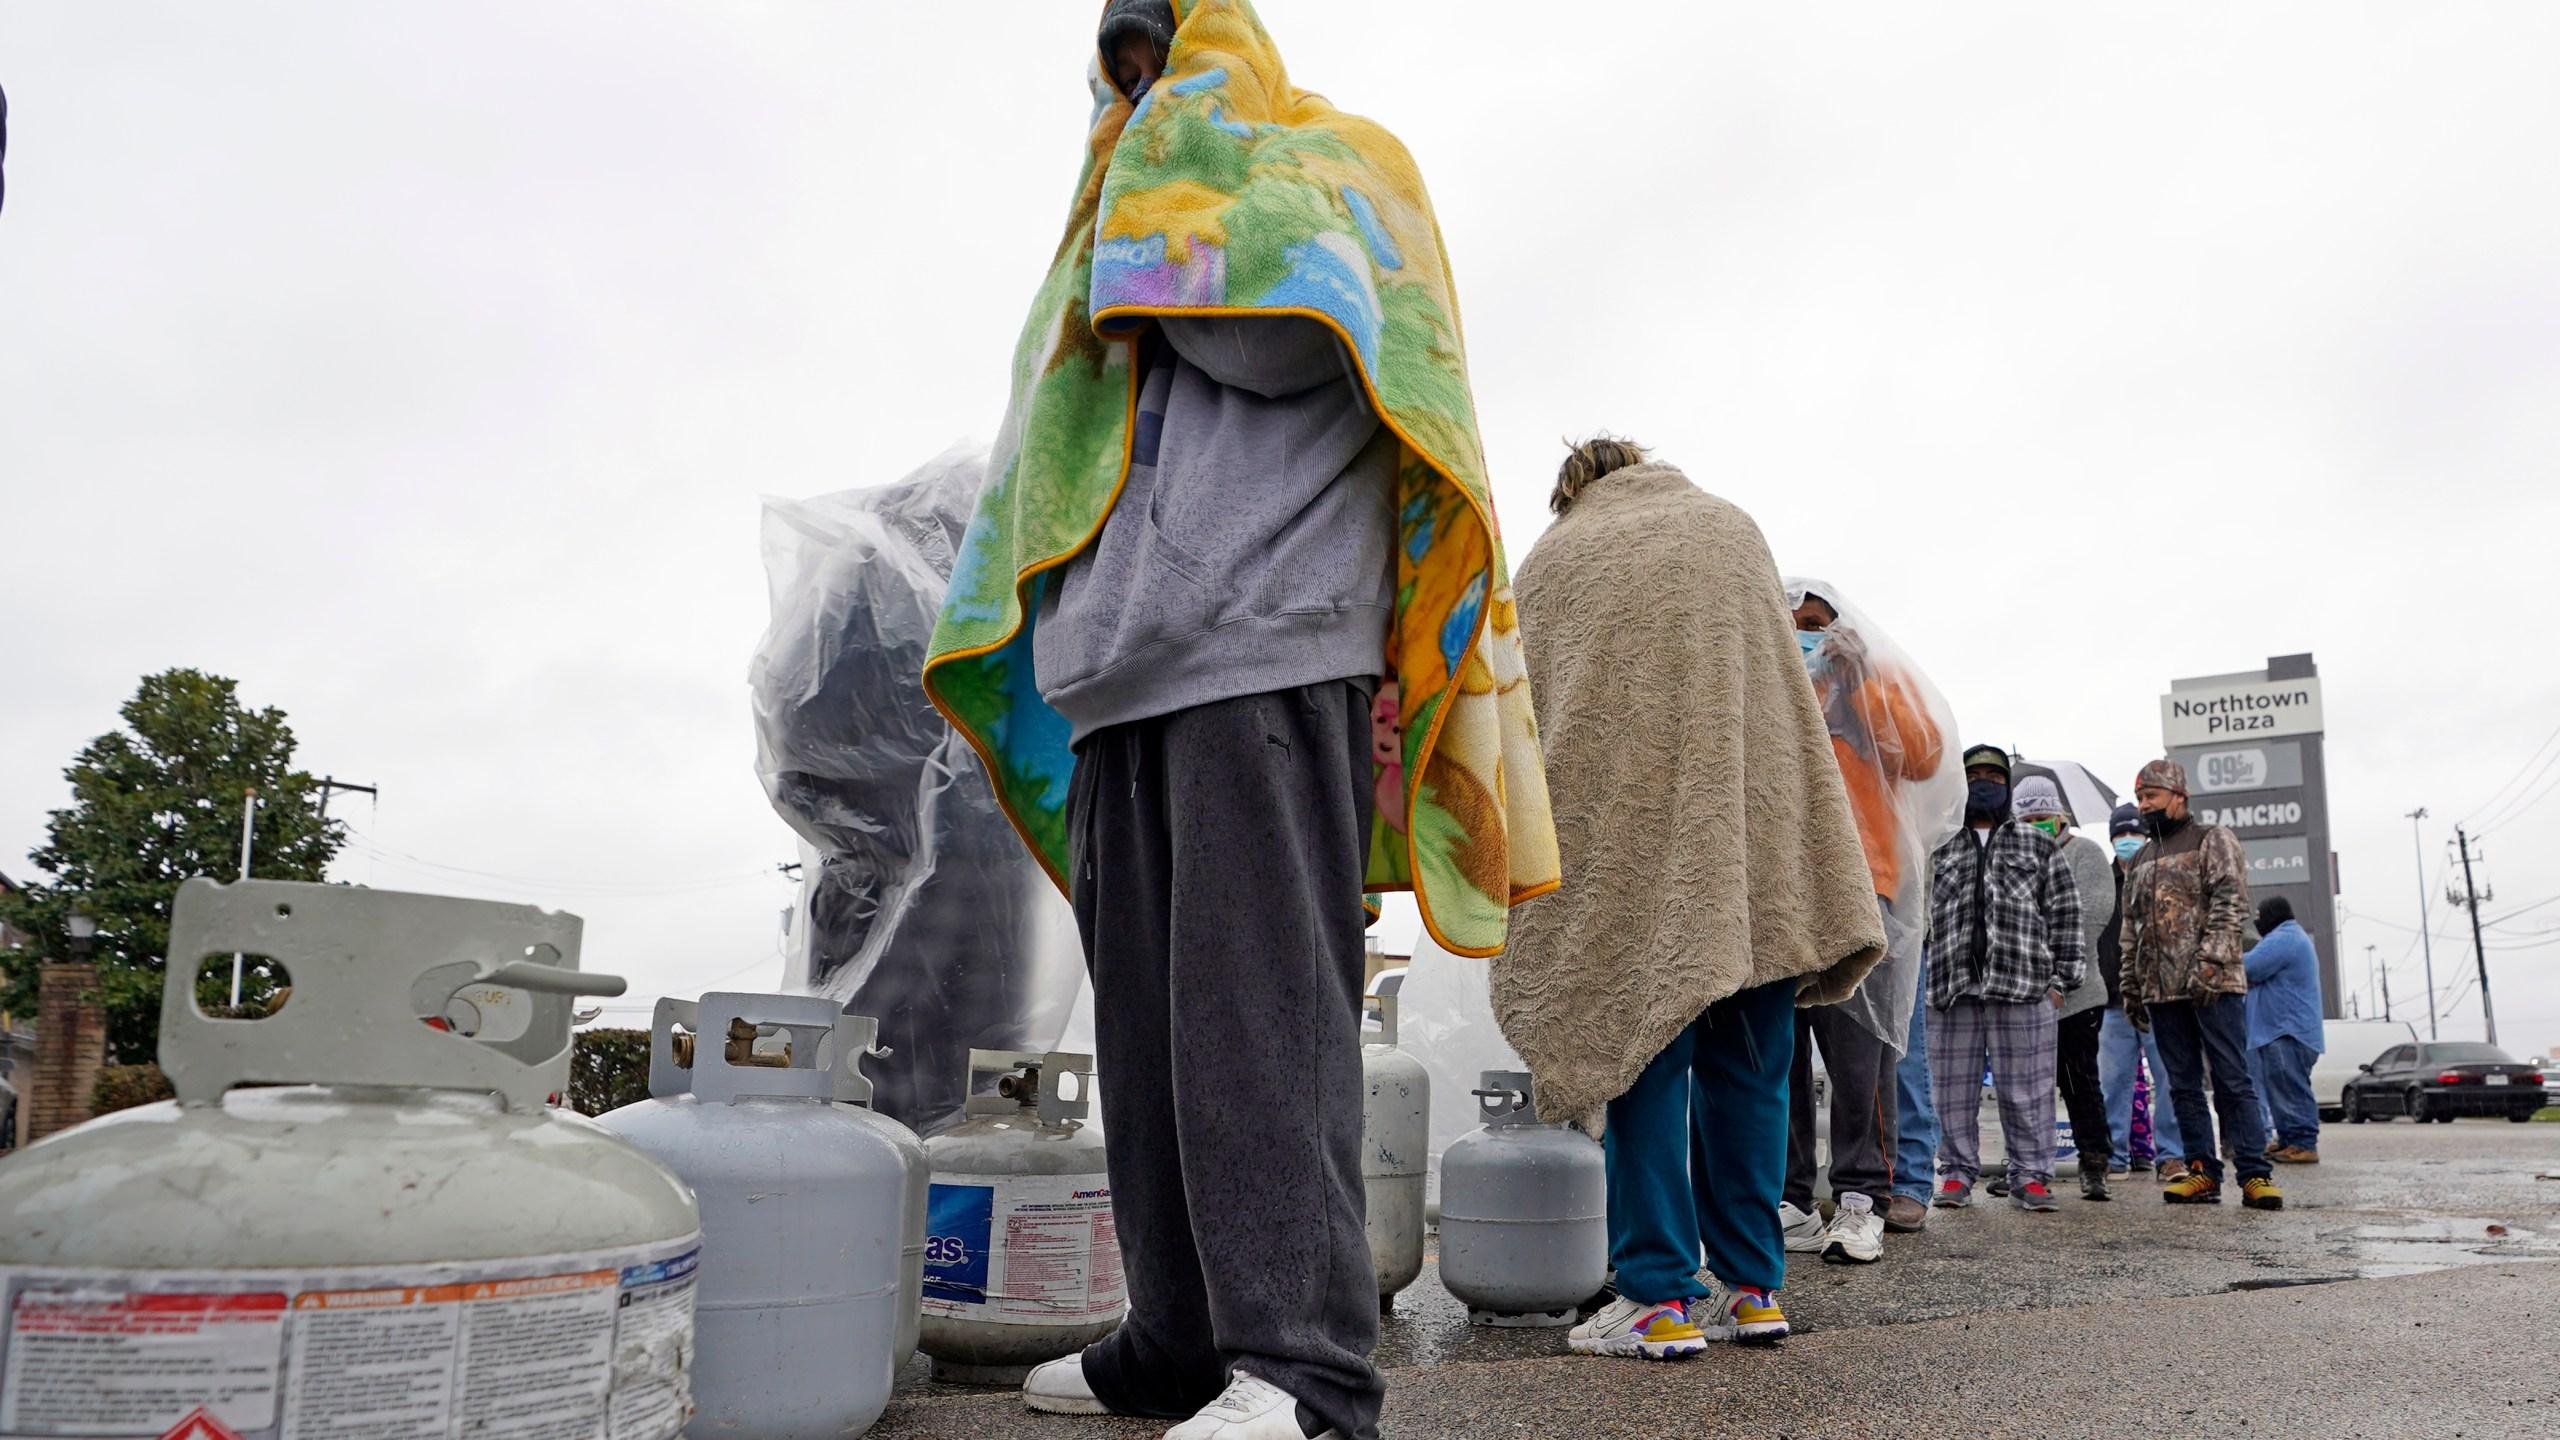 Carlos Mandez waits in line to fill his propane tanks Wednesday, Feb. 17, 2021, in Houston. (AP Photo/David J. Phillip)